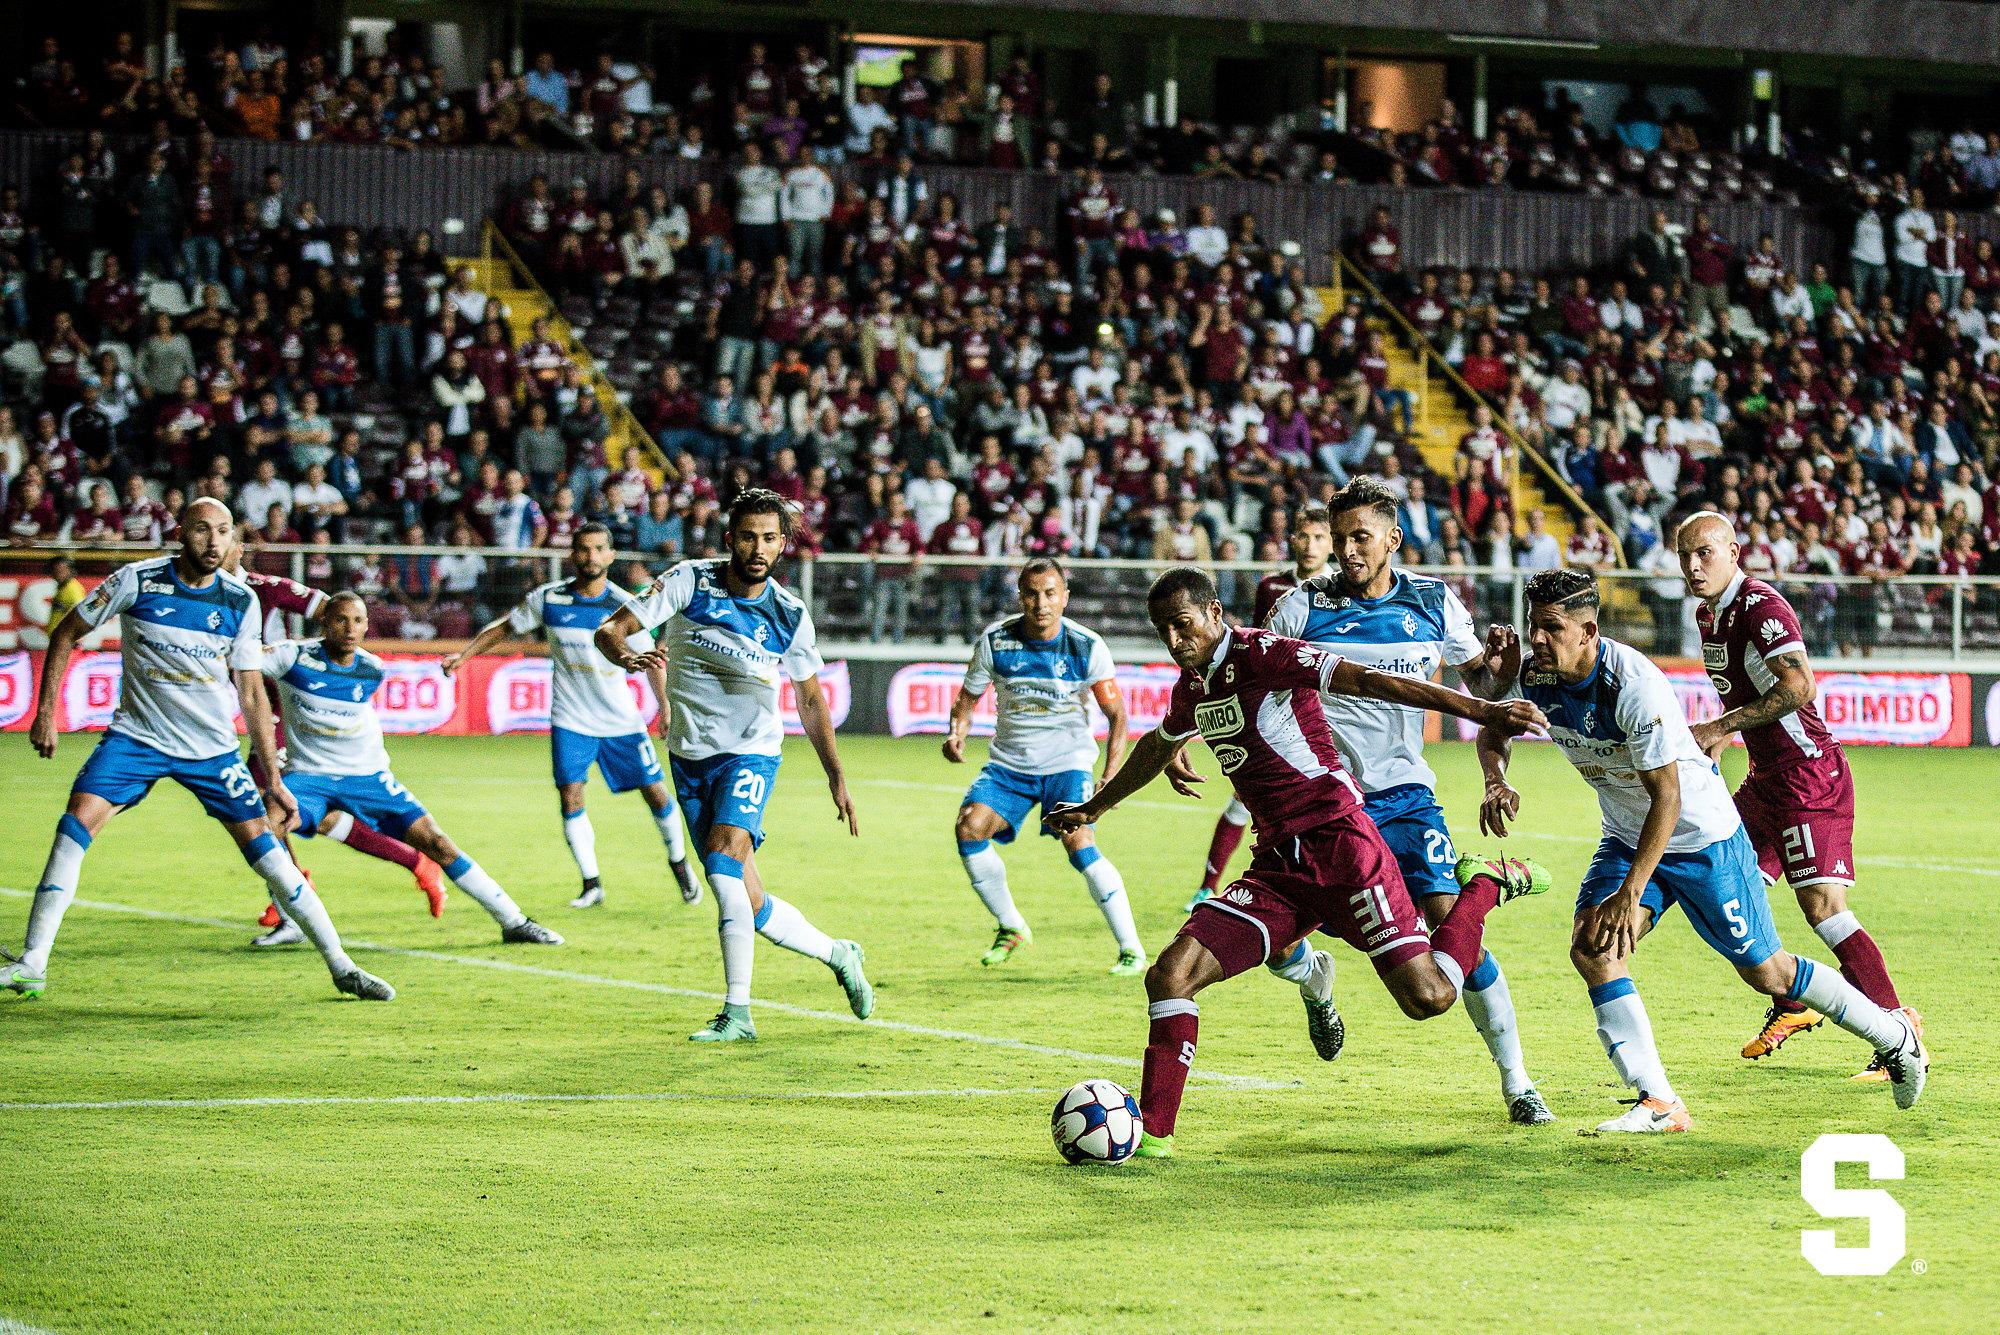 Saprissa 0-0 Cartaginés